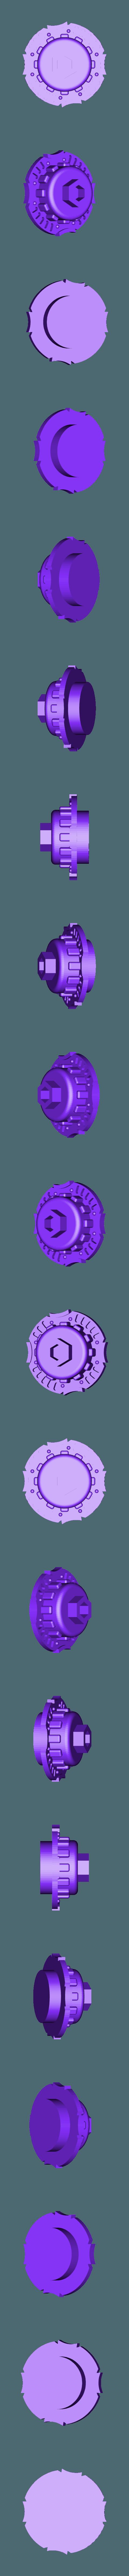 leg_joint_mid_smaller.stl Download free STL file Scuttling Spirit of the Machine God • 3D printer model, FelixTheCrazy